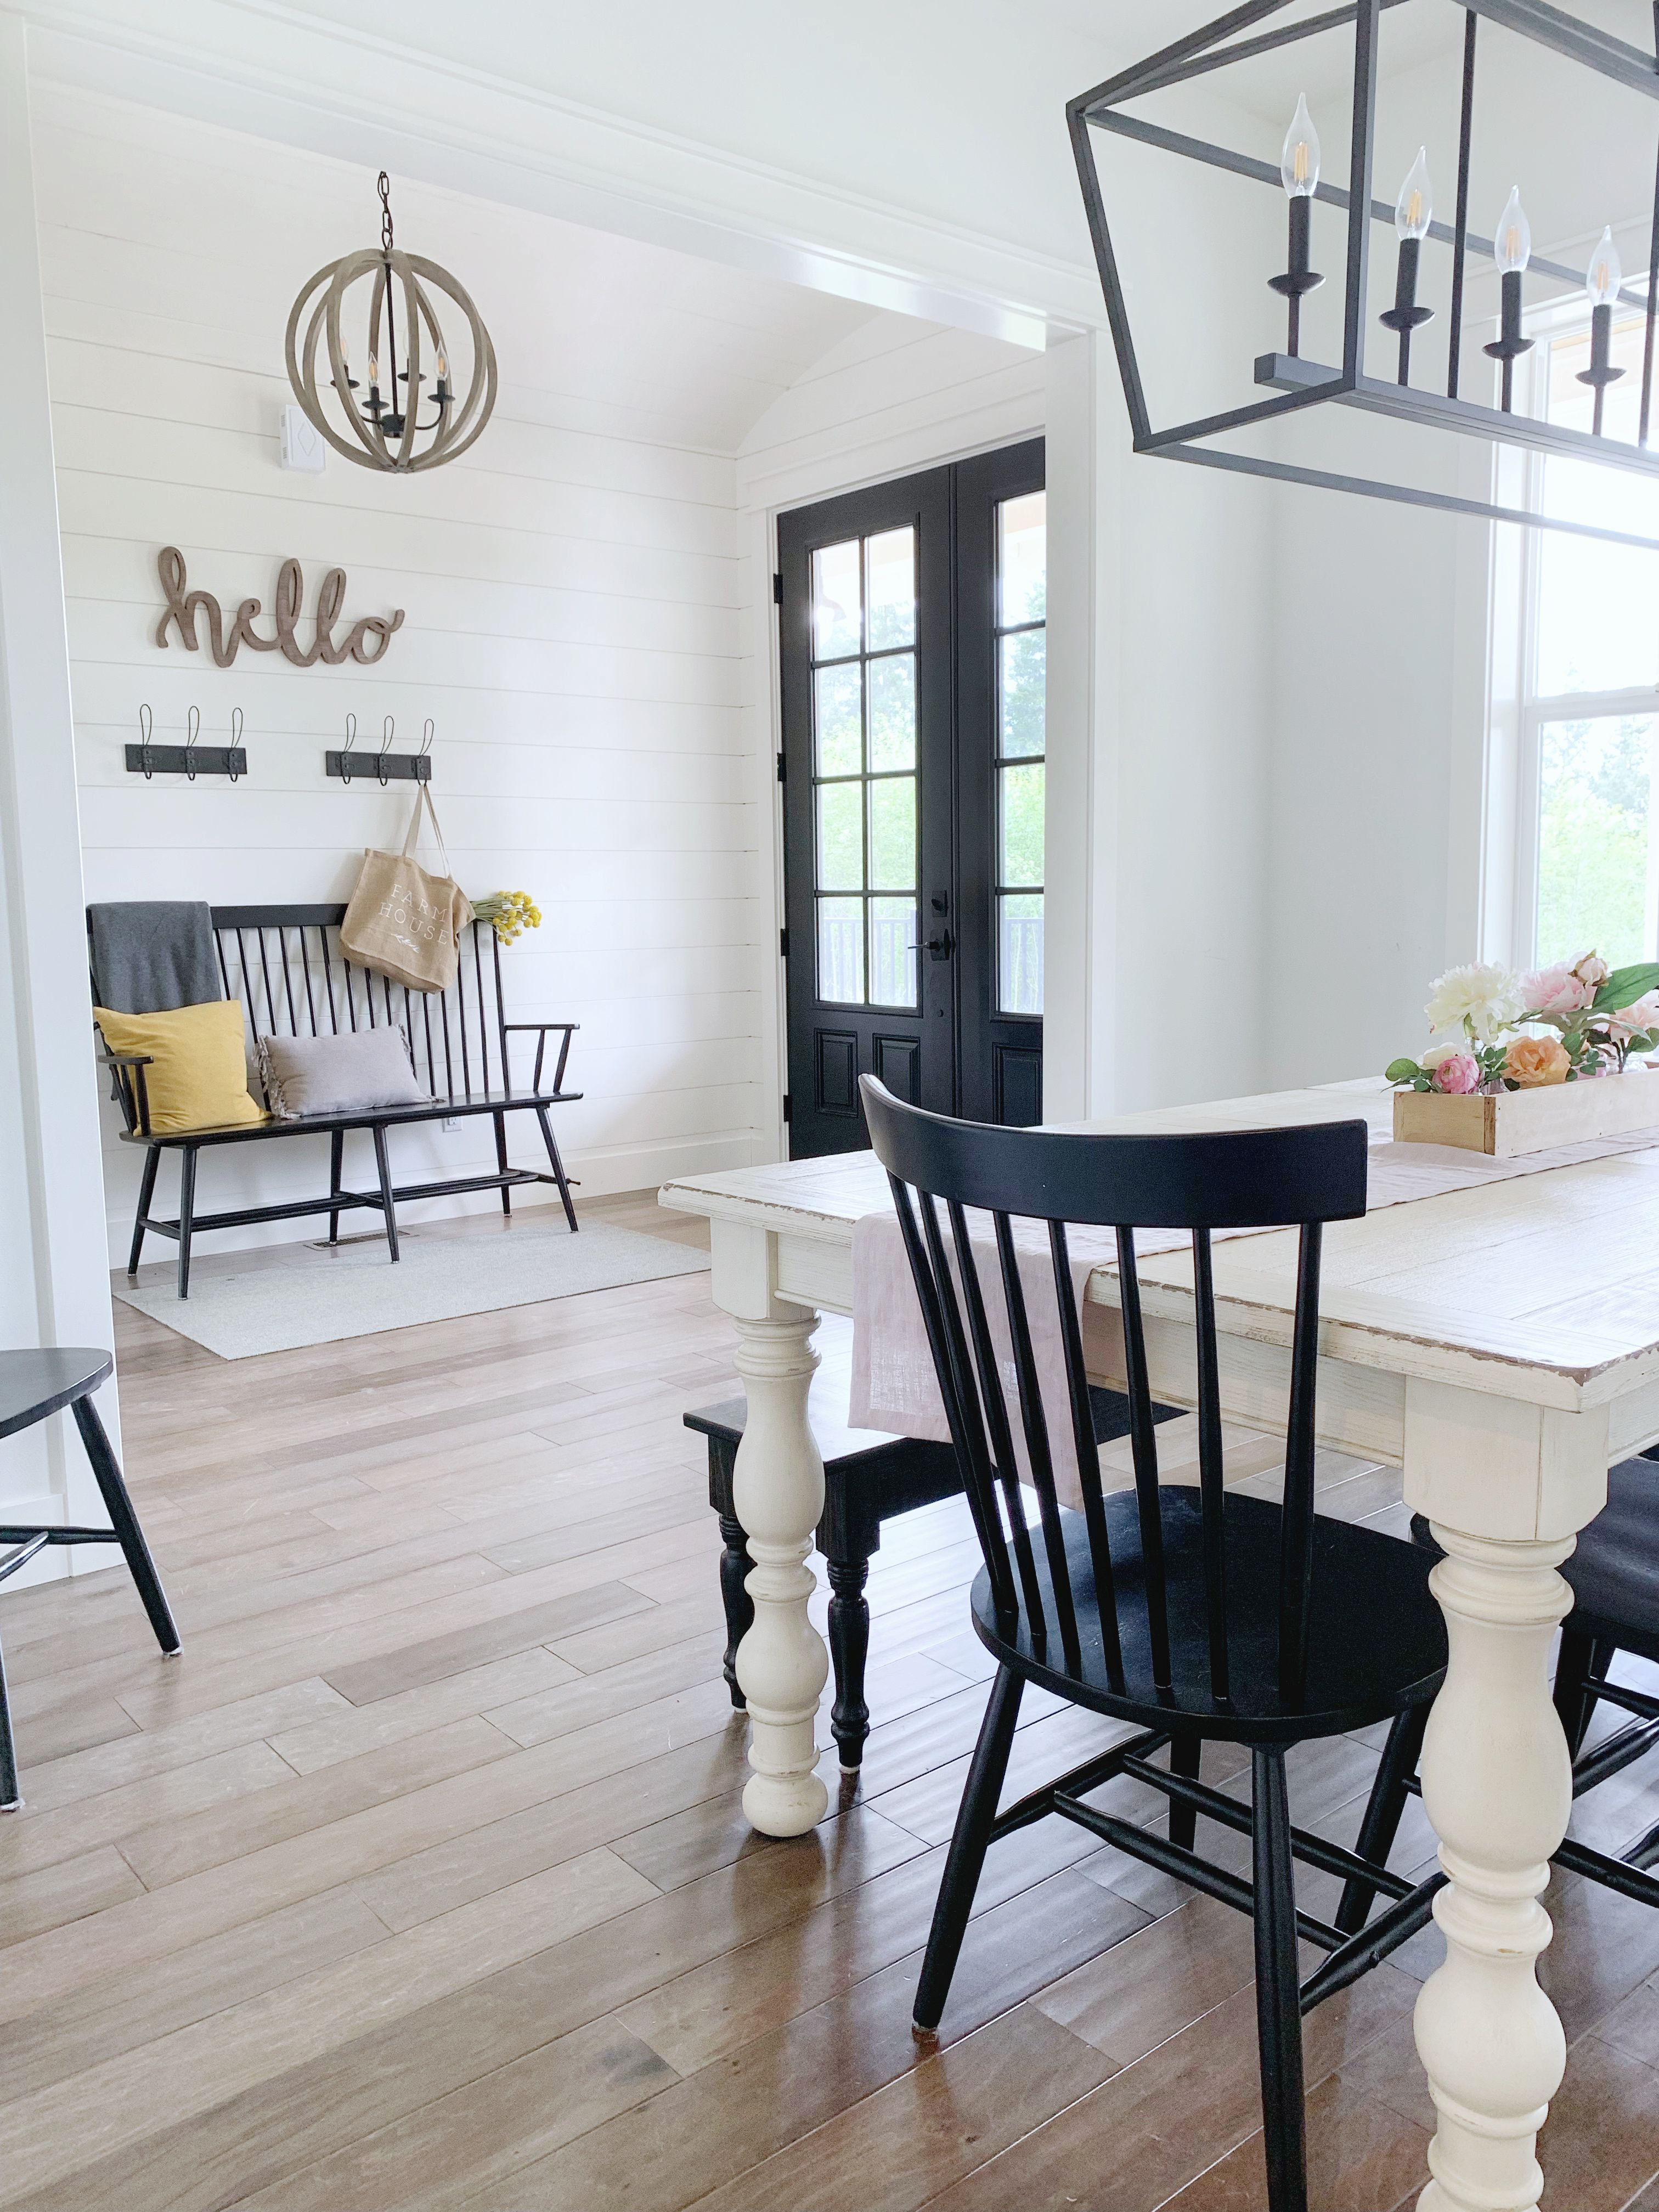 45+ White farmhouse table black chairs ideas in 2021